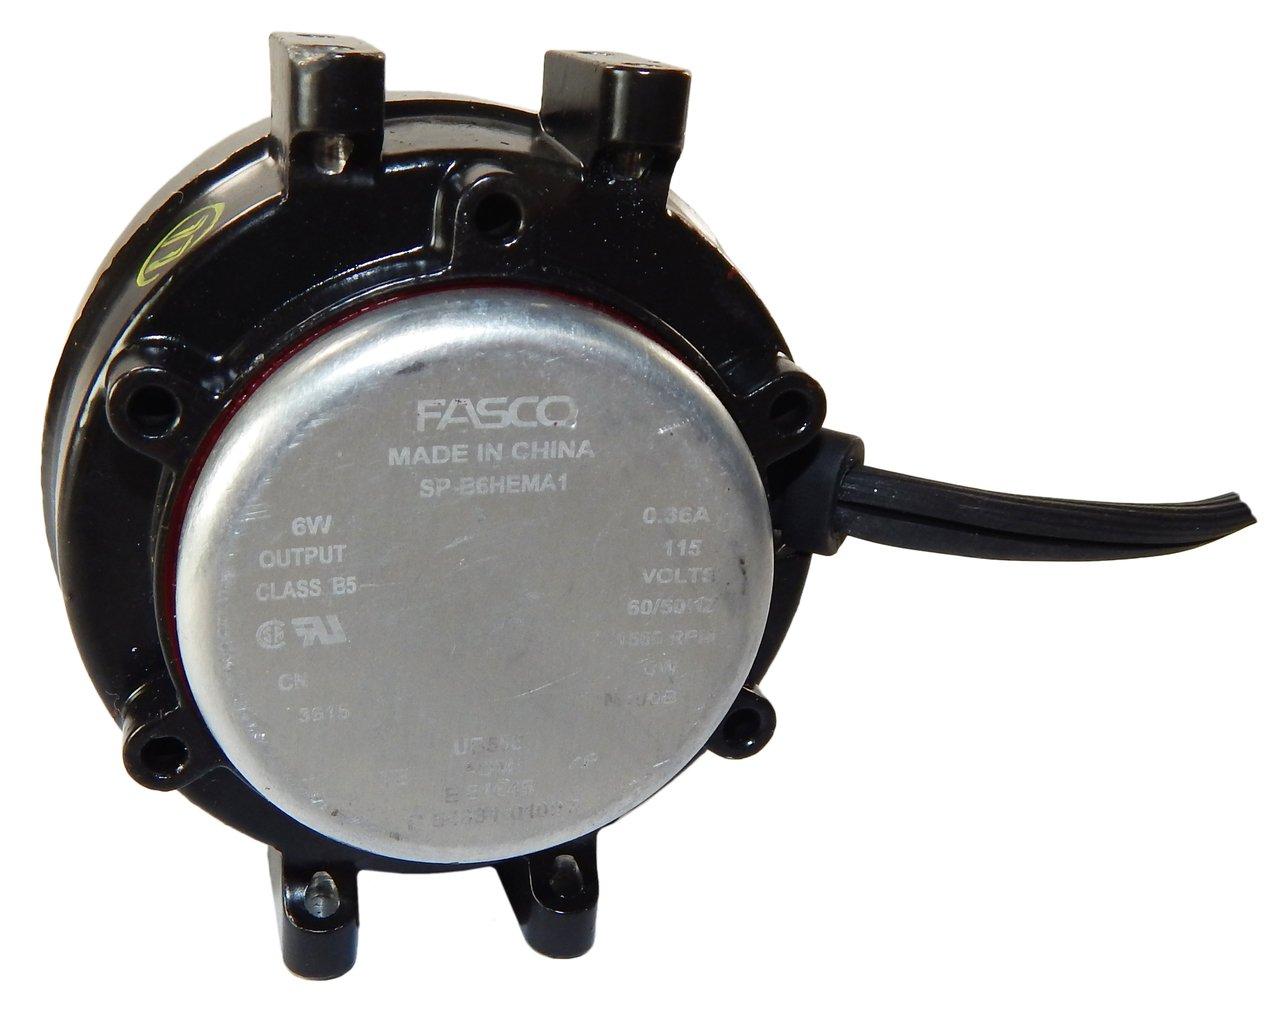 6 Watt 1550 RPM CWLE 115V Unit Bearing Refrigeration Electric Motor # UB558